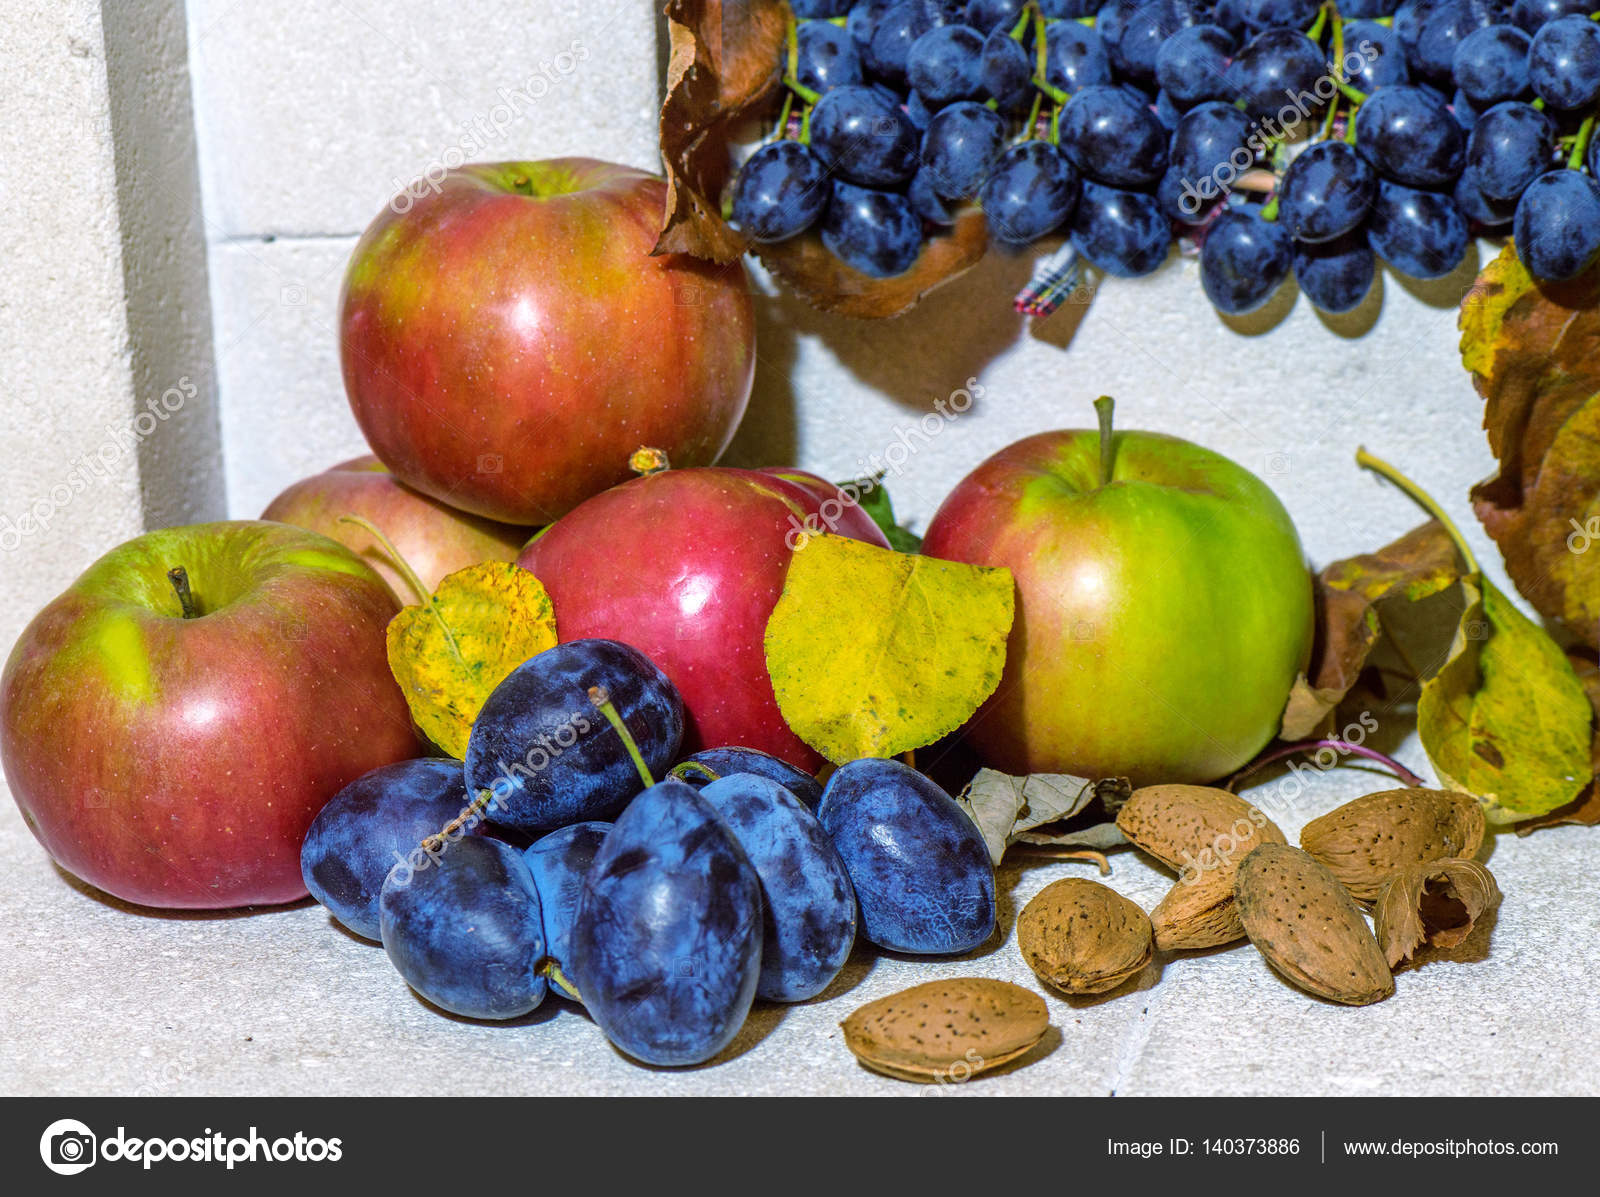 Autumn Seasonal Fruits Harvest Stock Photo C Inagraur Ymail Com 140373886